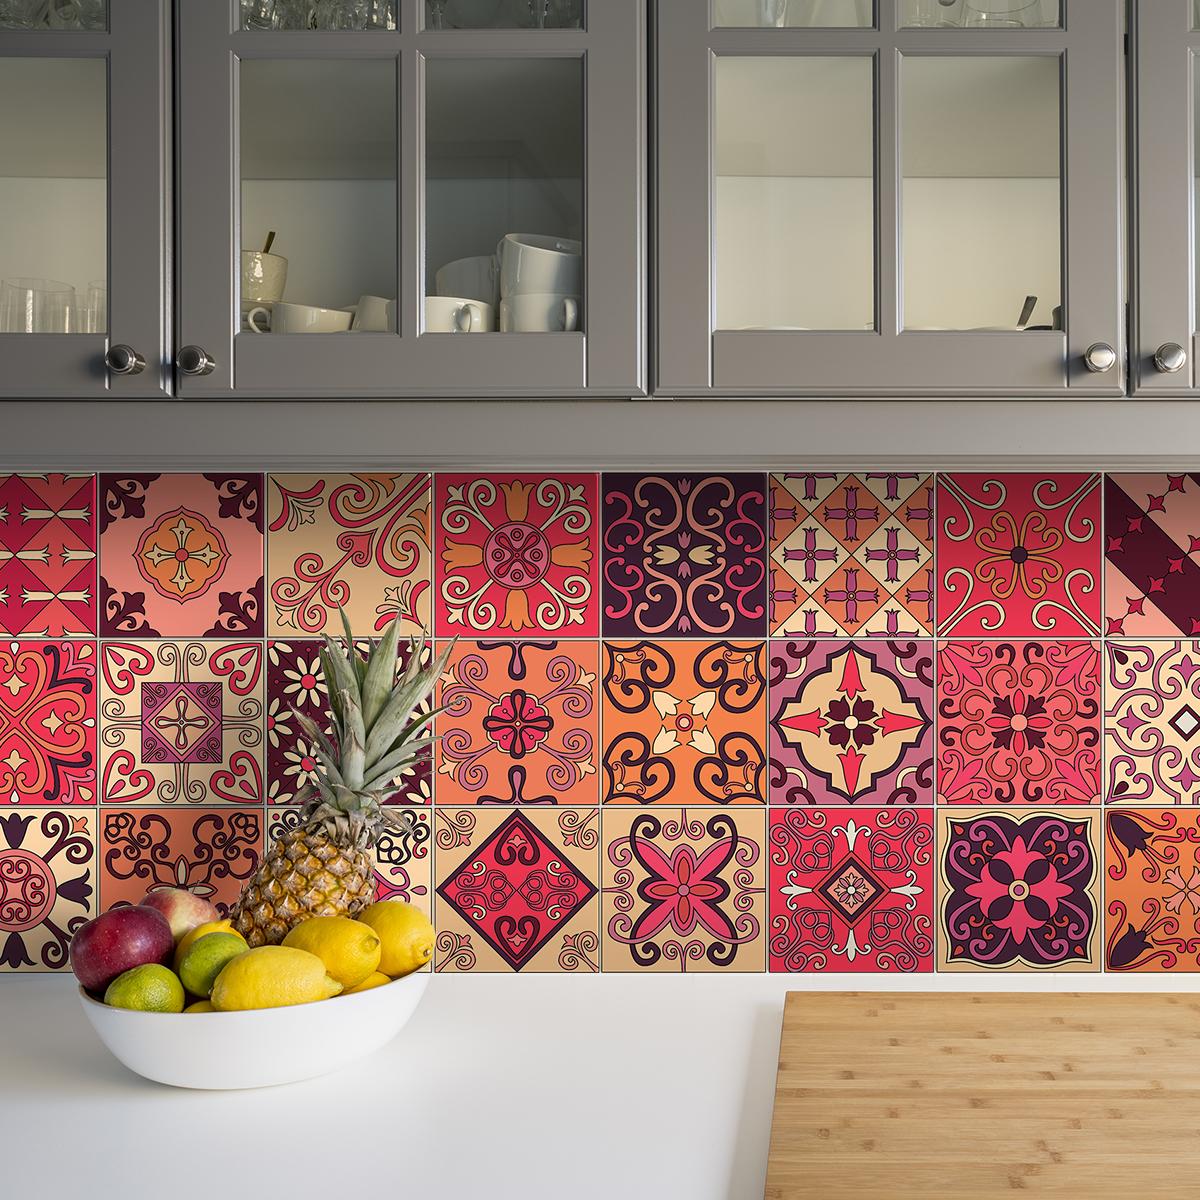 9 stickers carreaux de ciment azulejos cipriano cuisine - Stickers cuisine carrelage ...